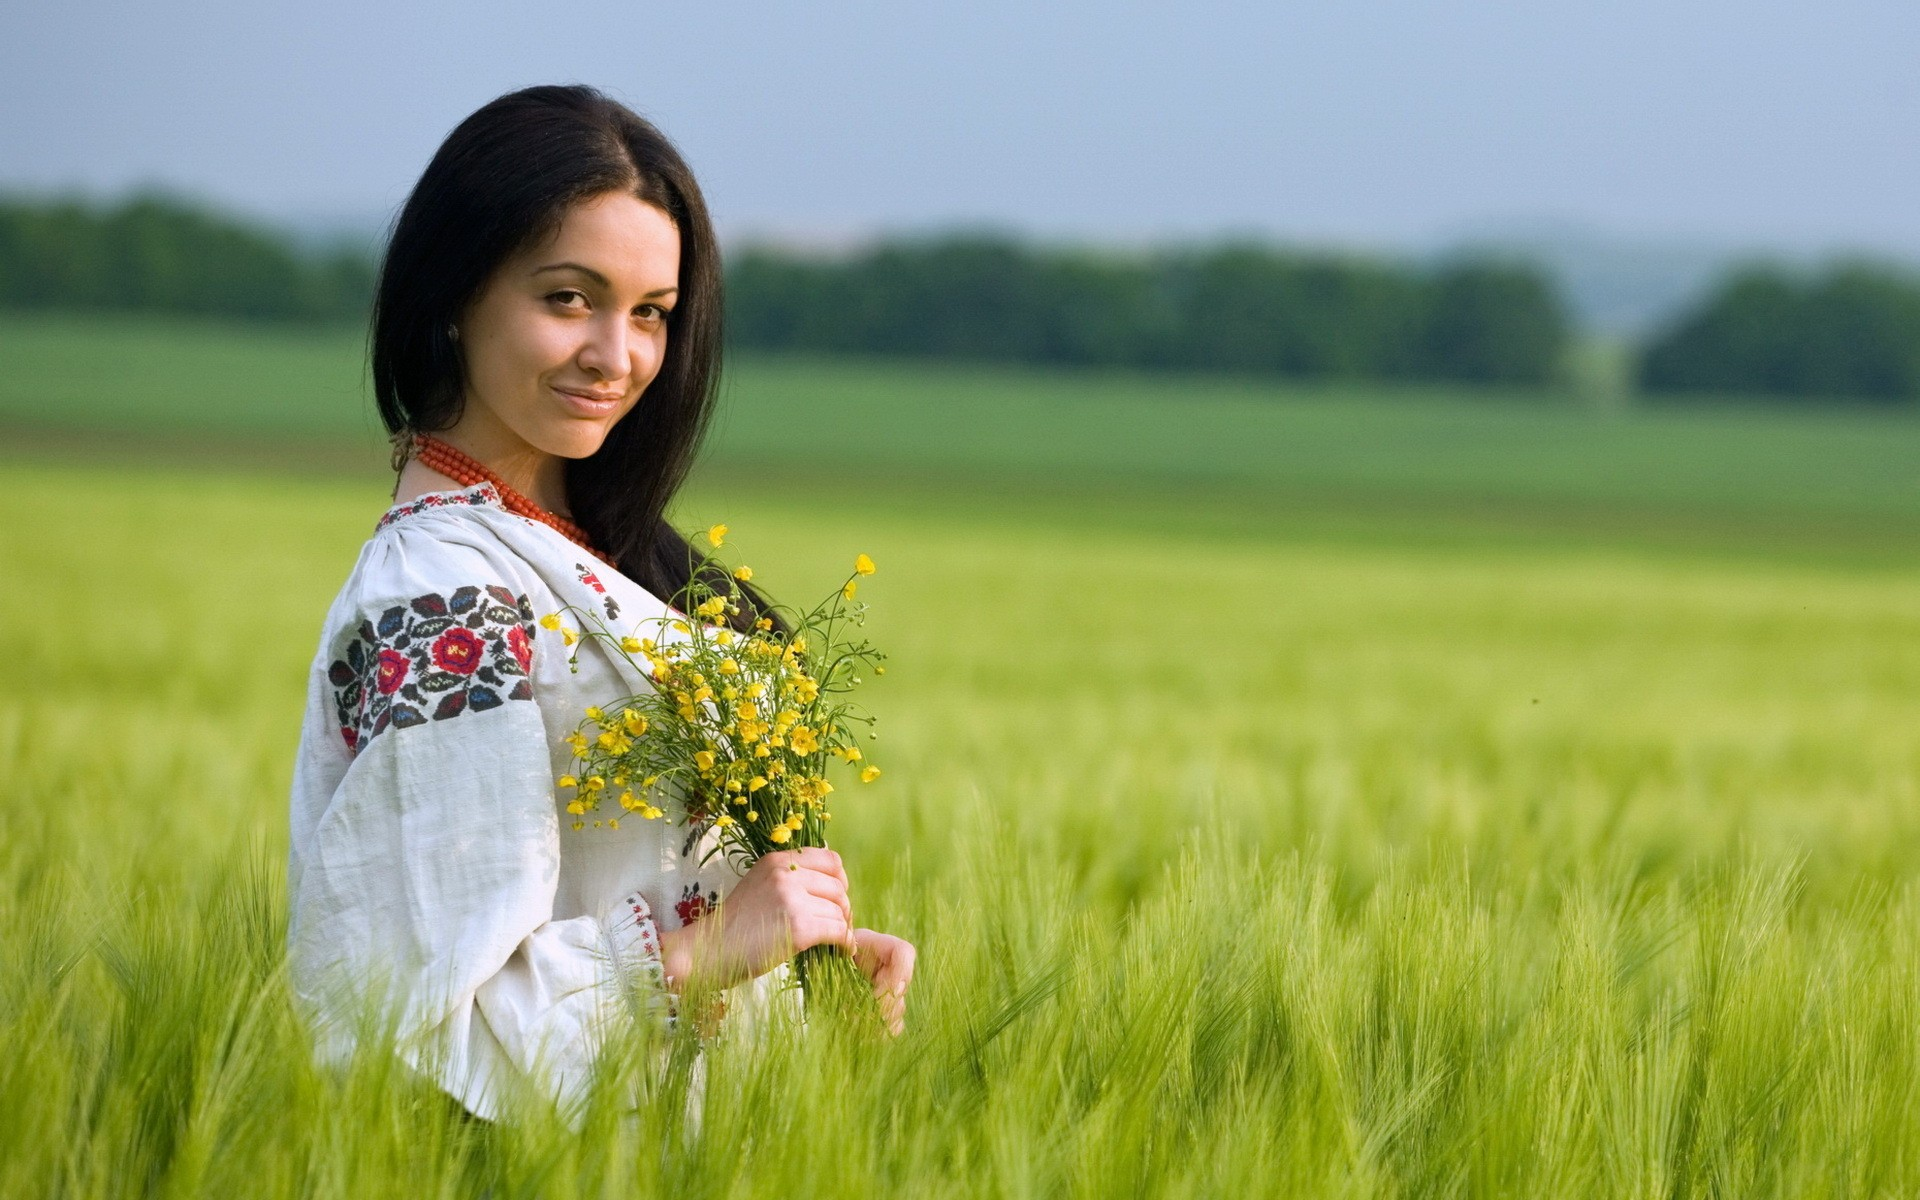 500 sel w126 engine f wallpaper 2048x1536 332128 wallpaperup - 500 Sel W126 Engine F Wallpaper 2048x1536 332128 Wallpaperup 14 Women Nature Grass Ukraine Wallpaper Download